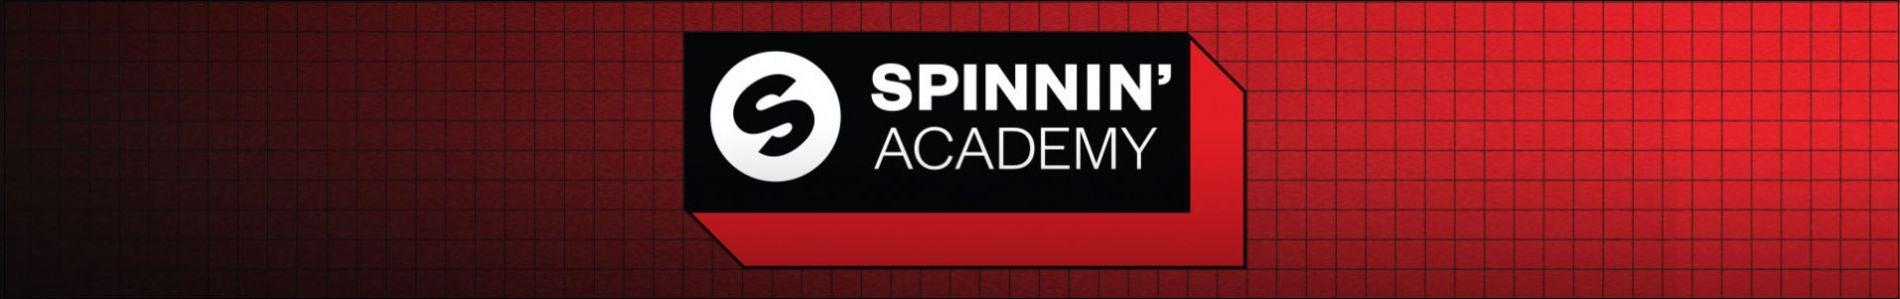 Spinnin' Sessions Spinnin' Academy | Dancefair